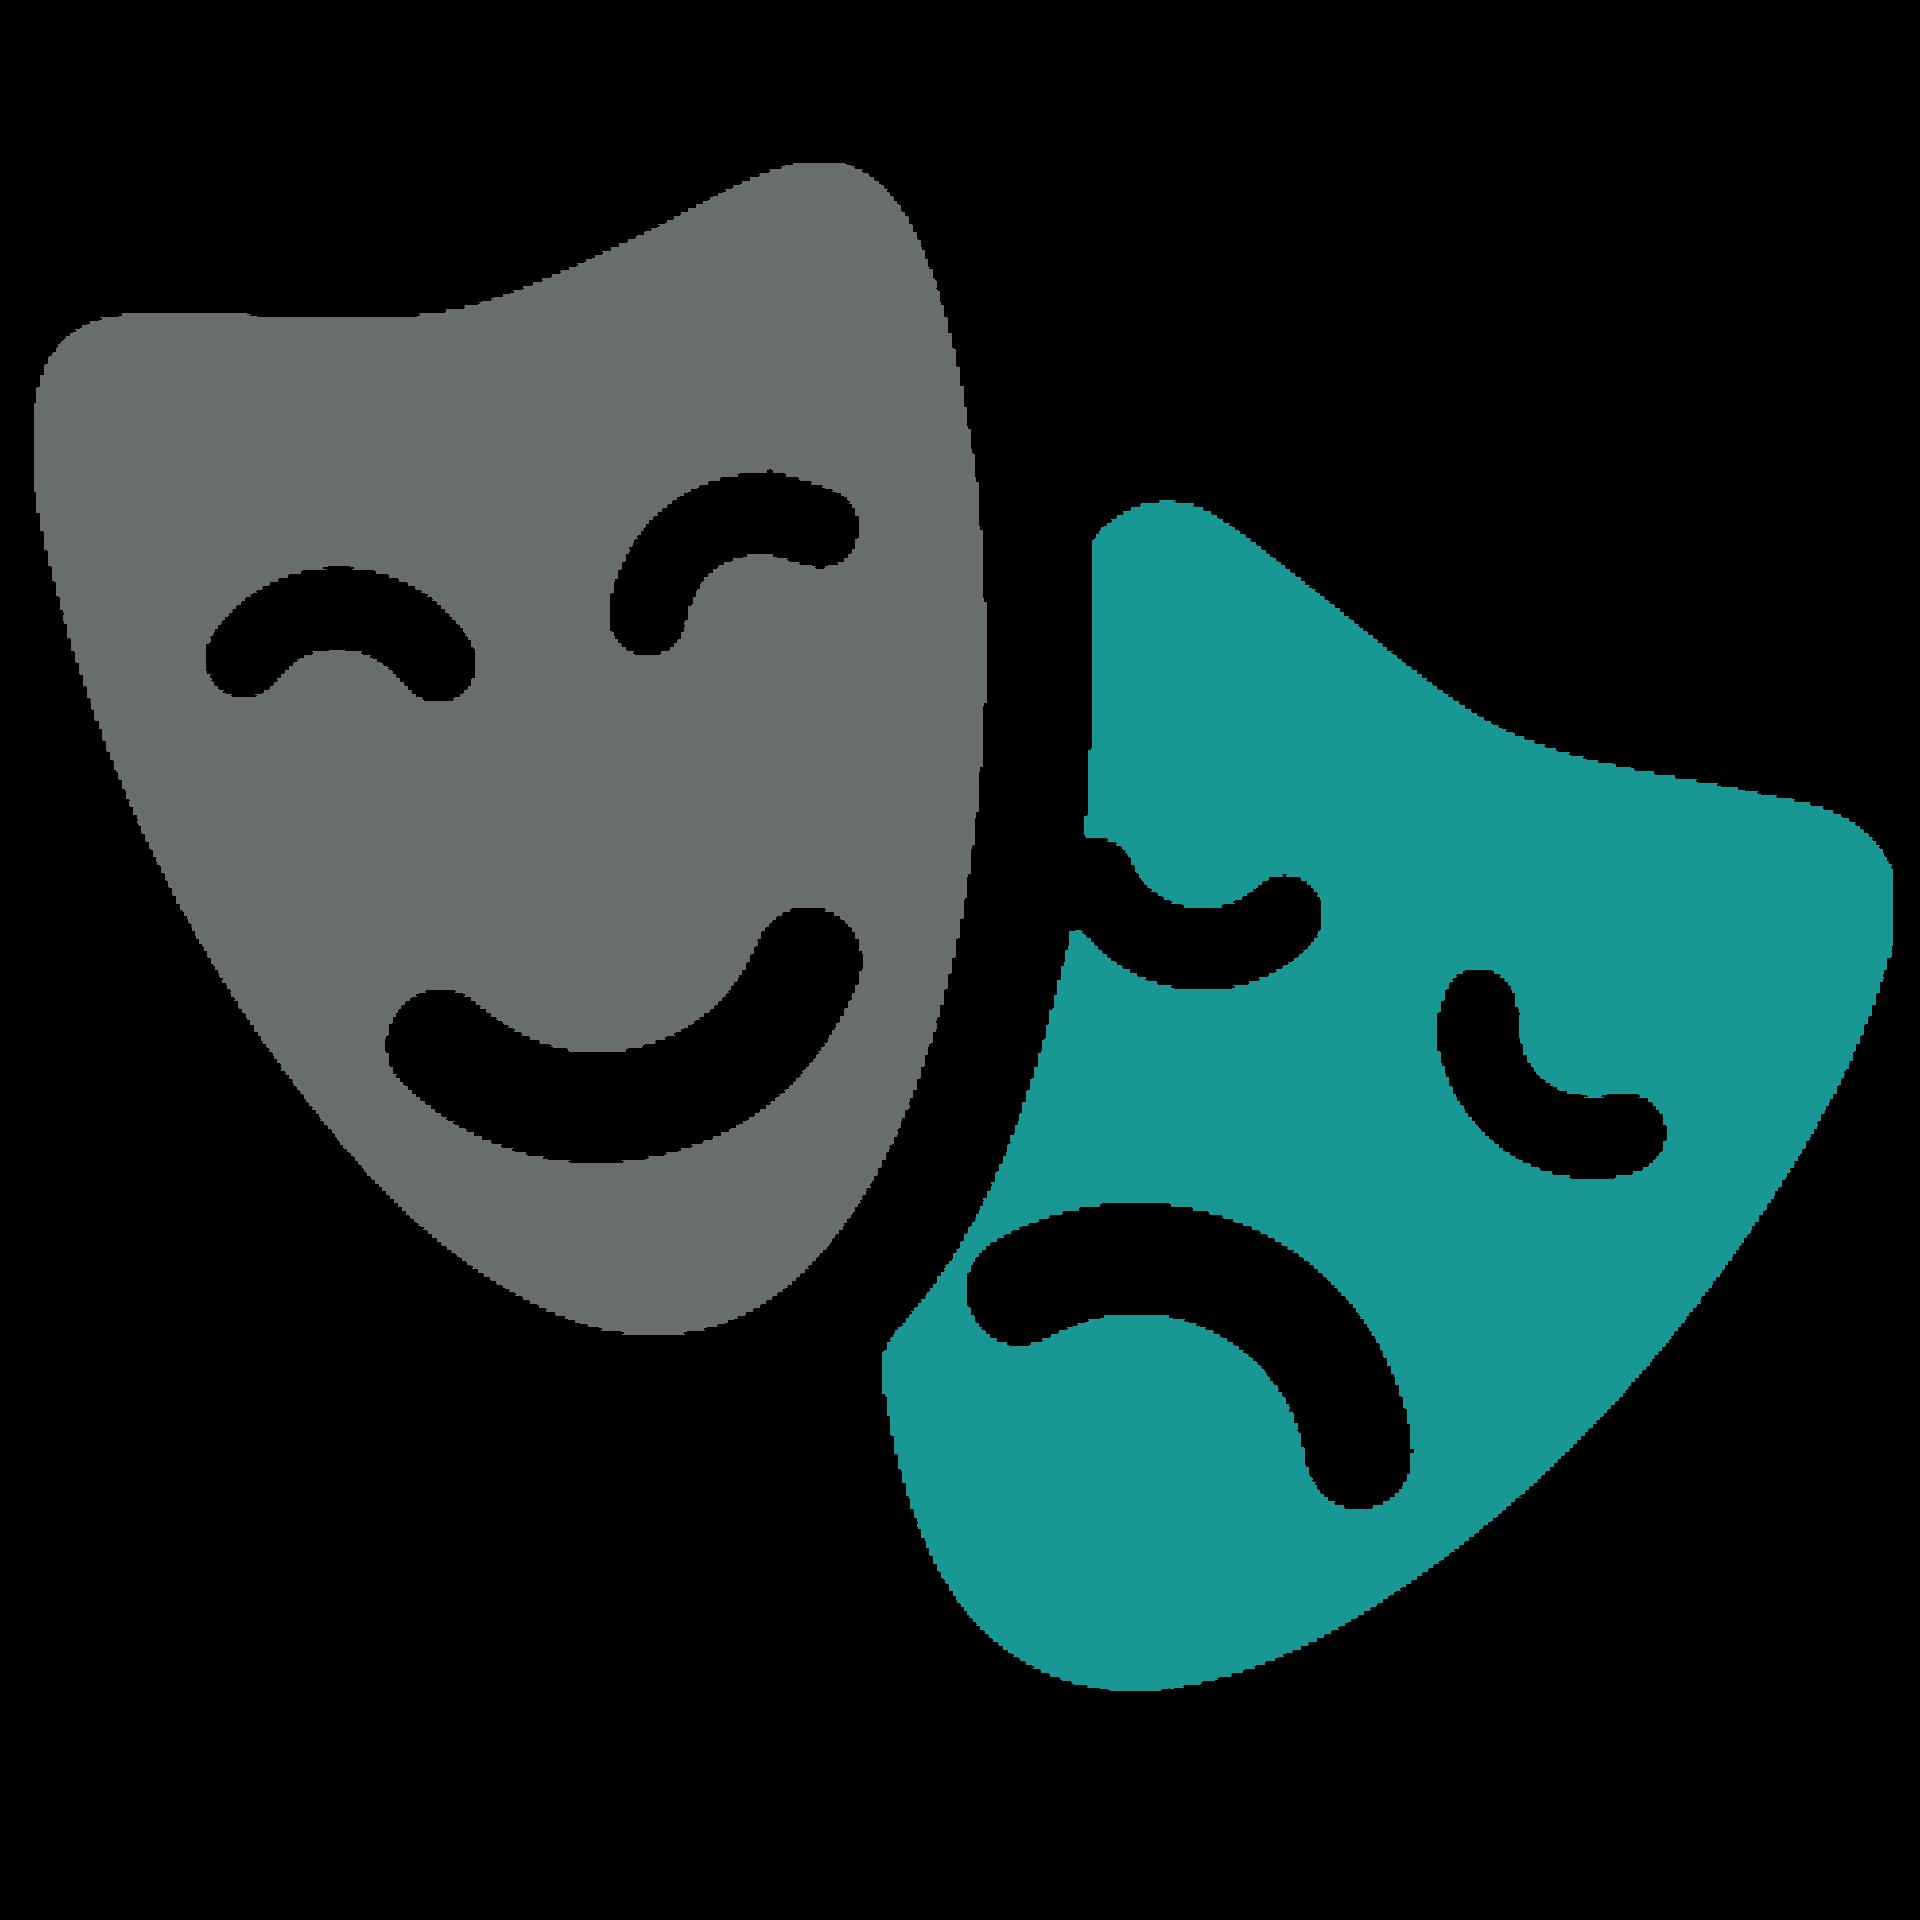 Mascaras de teatro